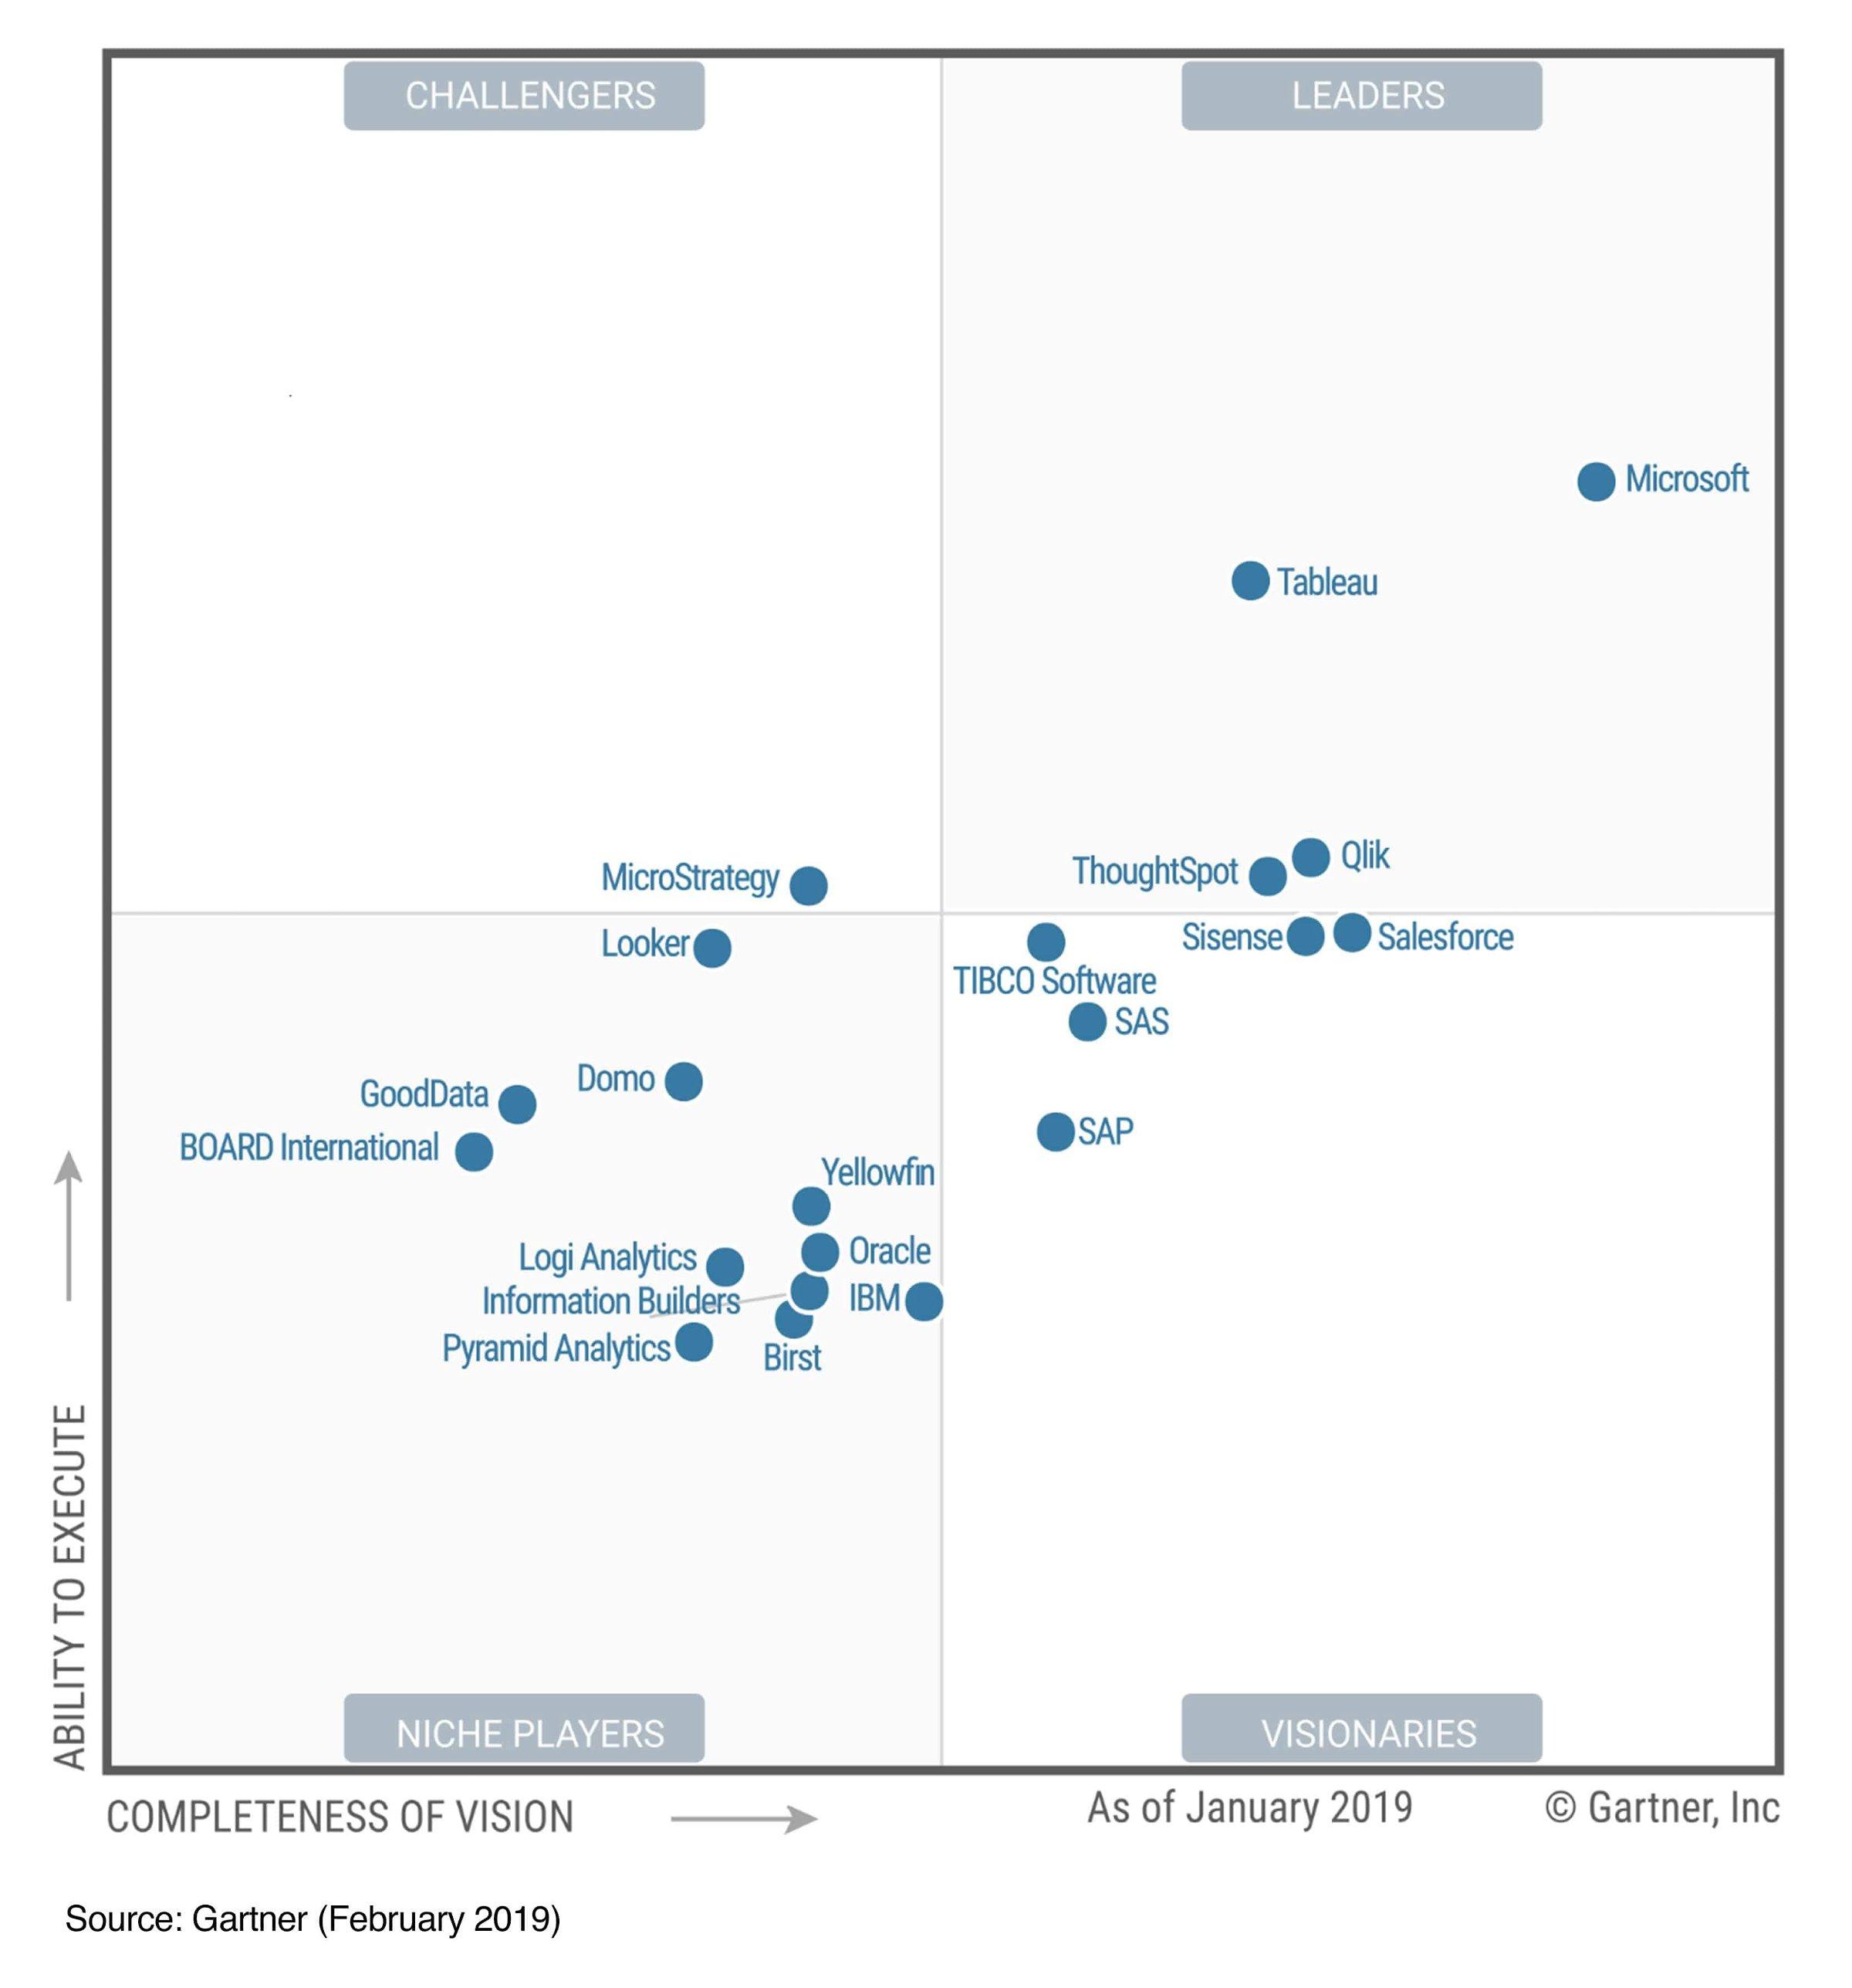 Microsoft Named BI & Analytics Leader by Gartner, 12th Straight Year